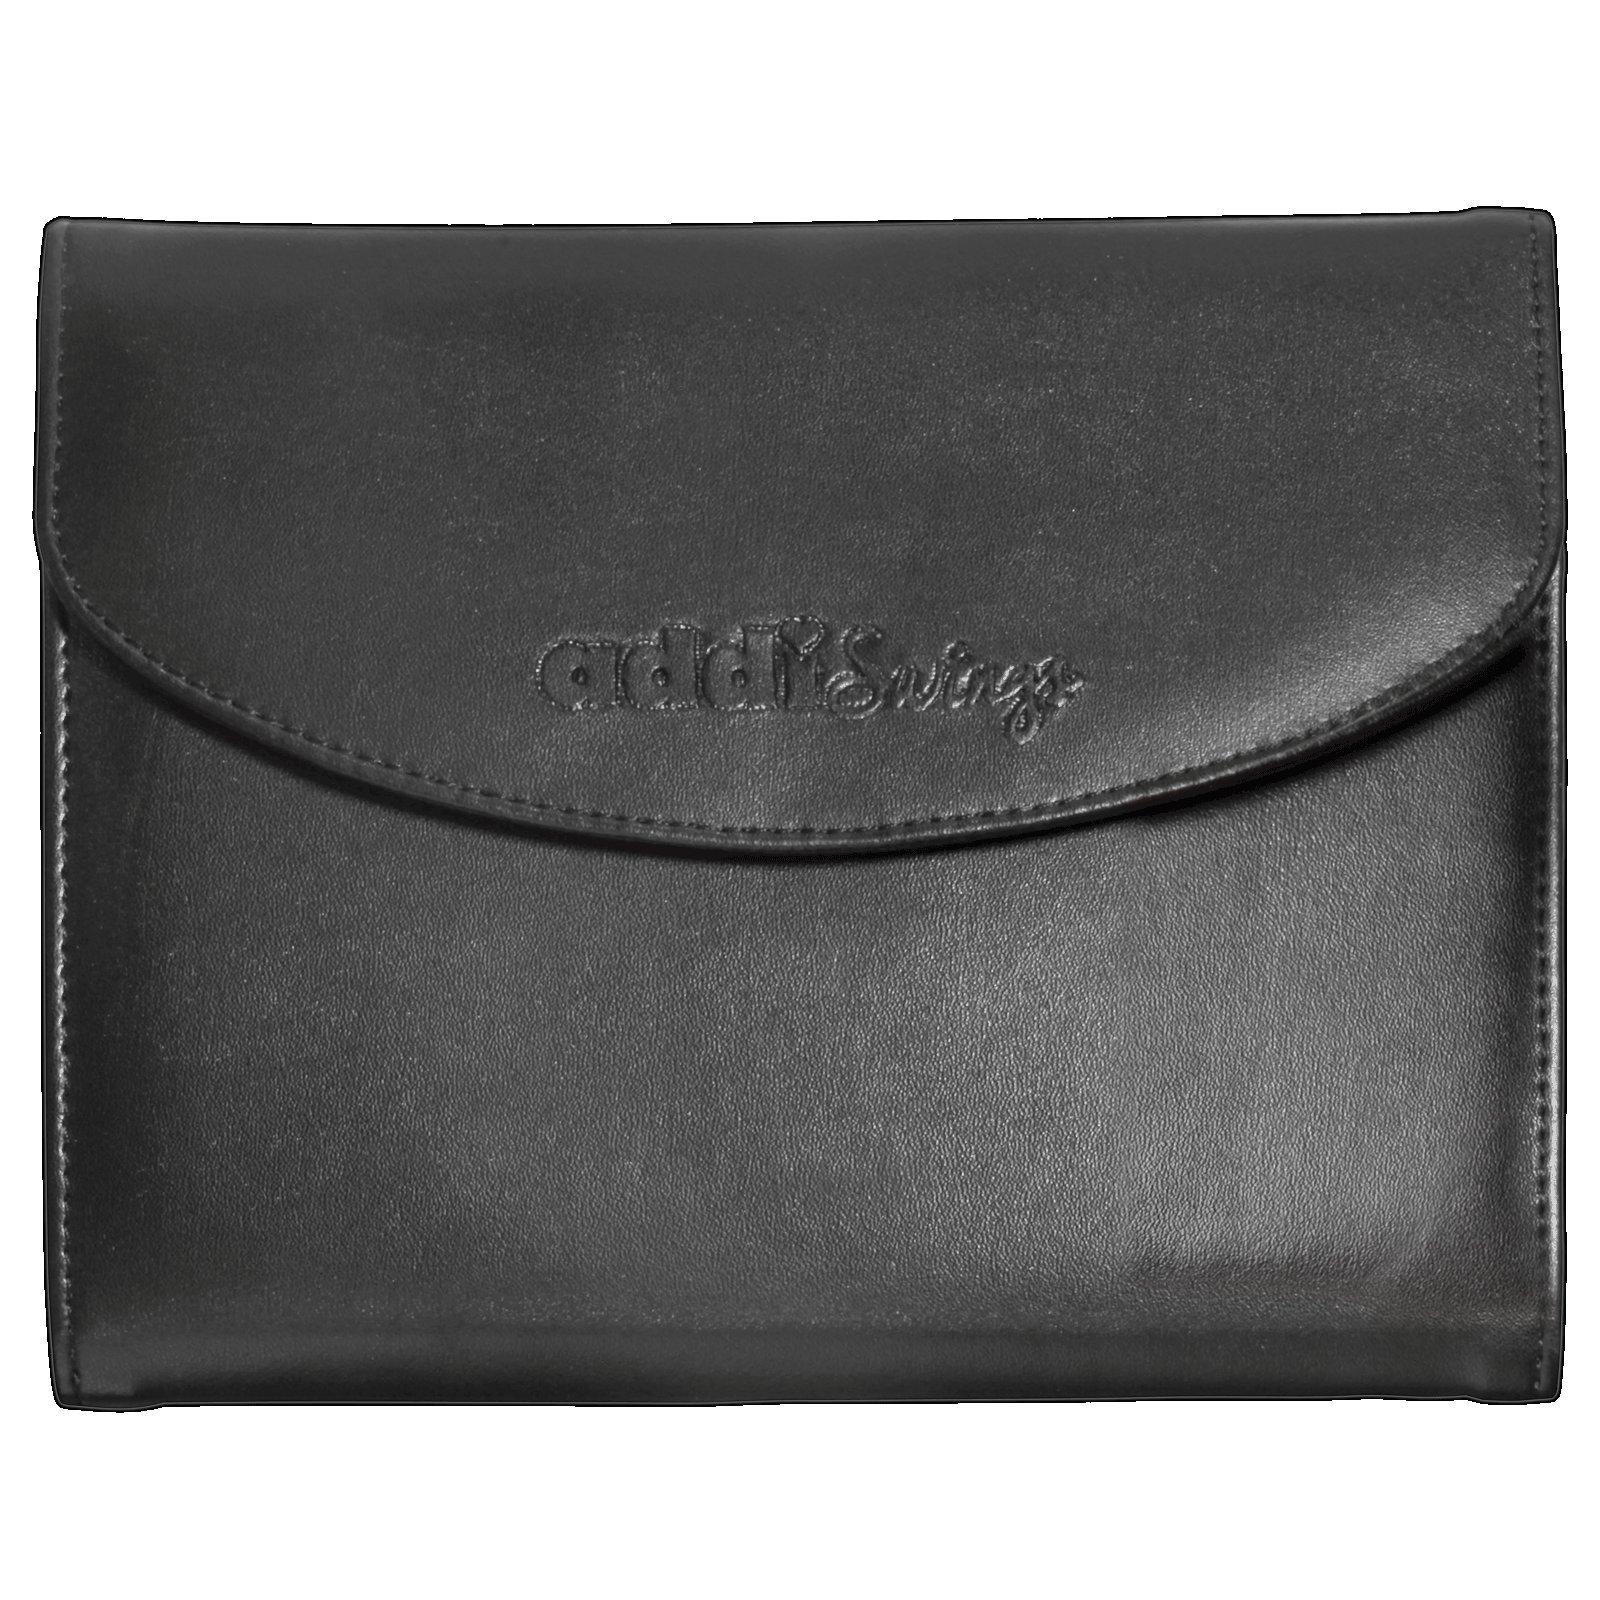 addi Swing Hooks - Set of 13 Hooks In Original addi Leather Cases by addi (Image #2)